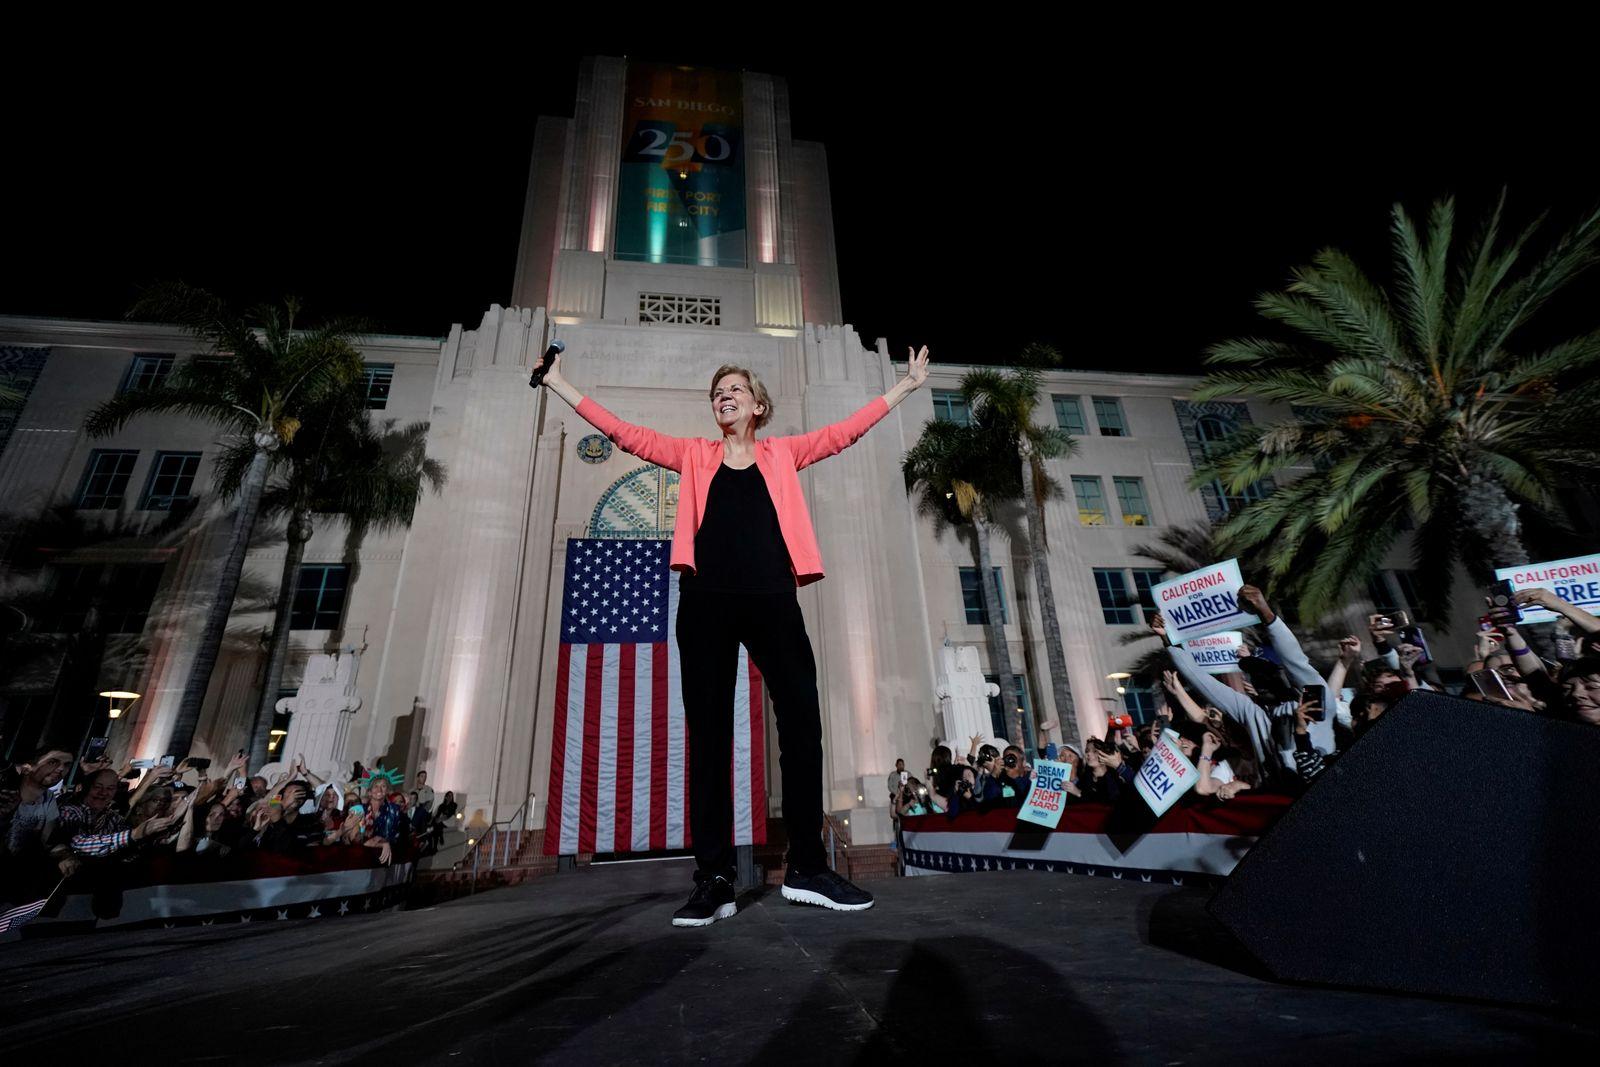 U.S. democratic presidential candidate Elizabeth Warren holds an outdoor rally in San Diego, California